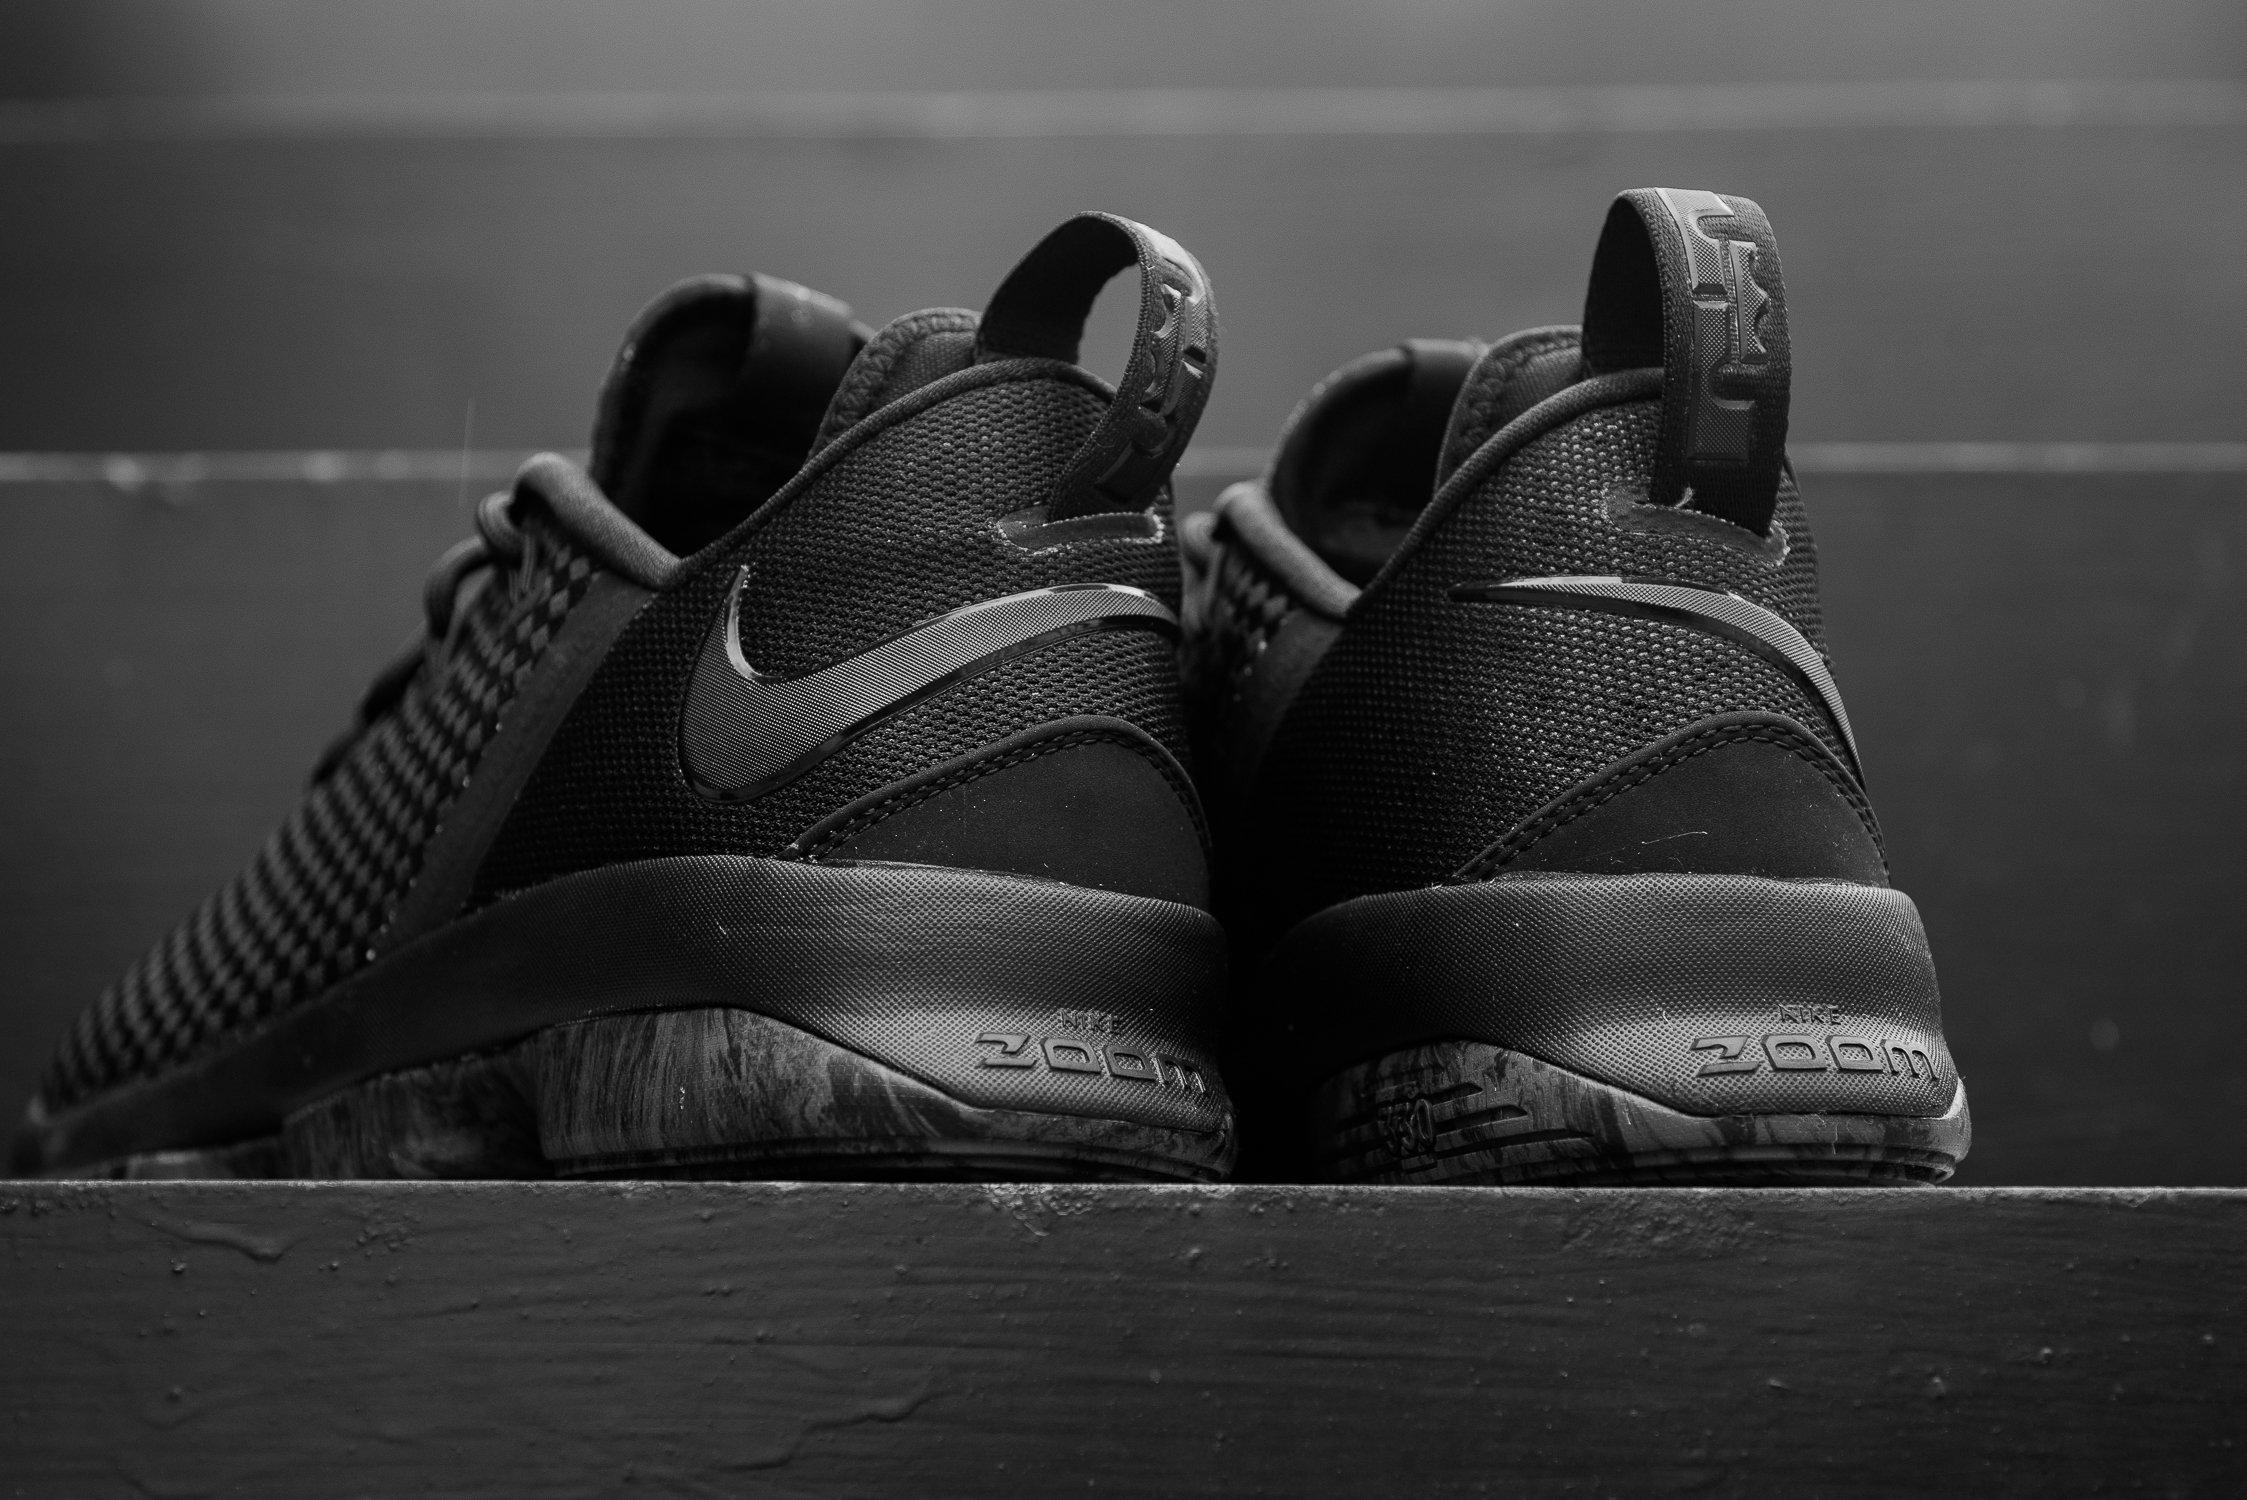 reputable site 15832 4e162 On Sale: Nike LeBron 14 Low